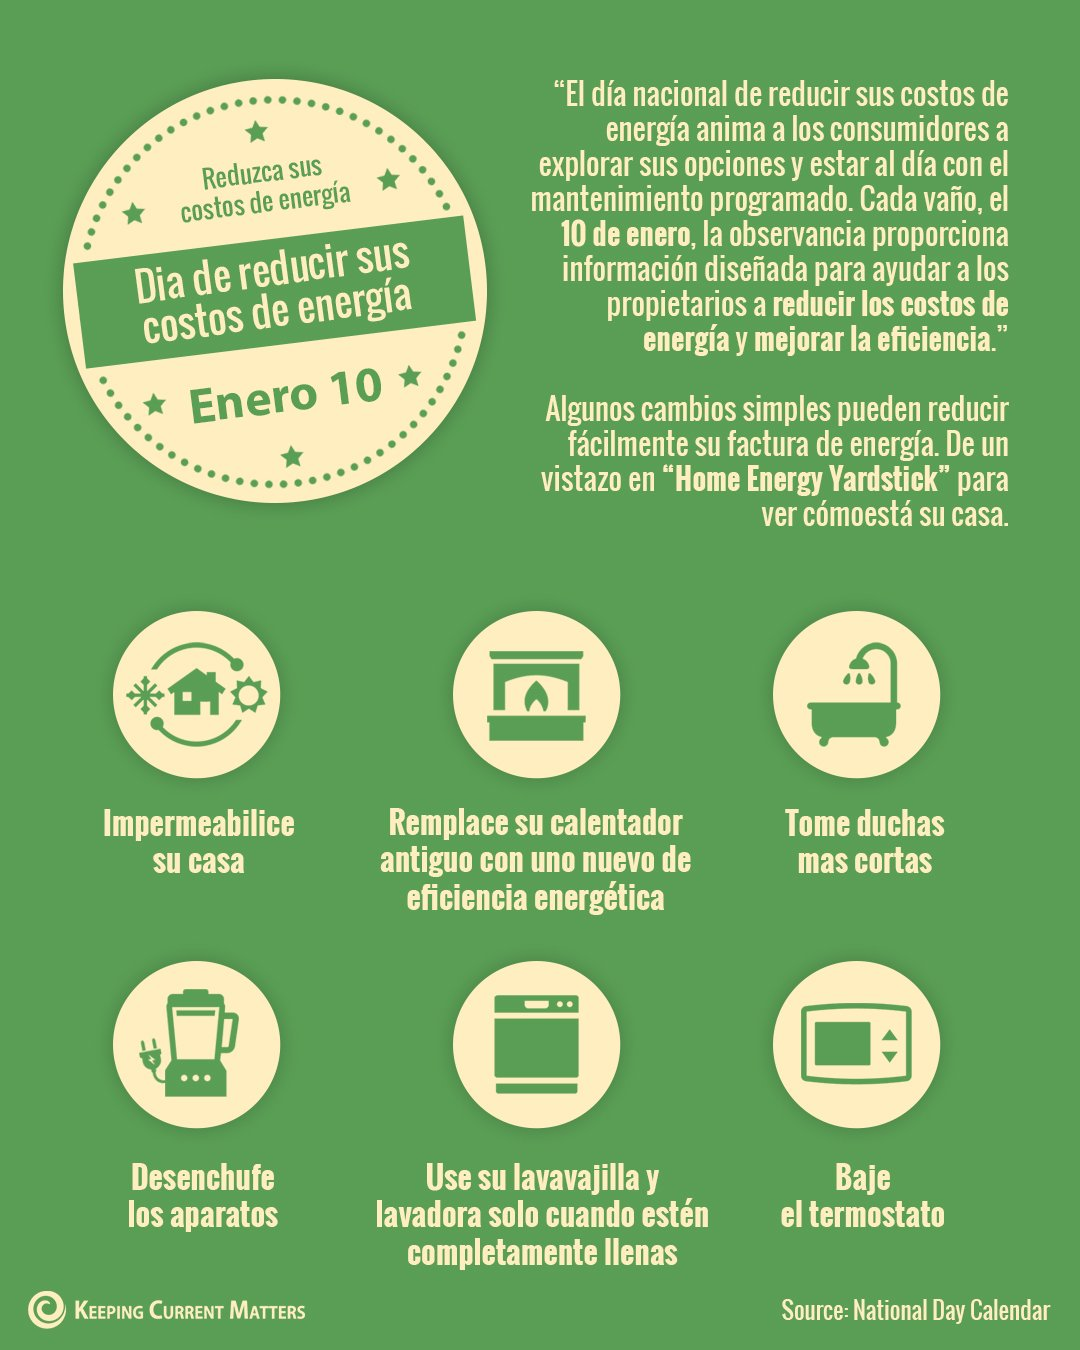 Dia nacional de reducir sus costos de energía [infografía] | Keeping Current Matters